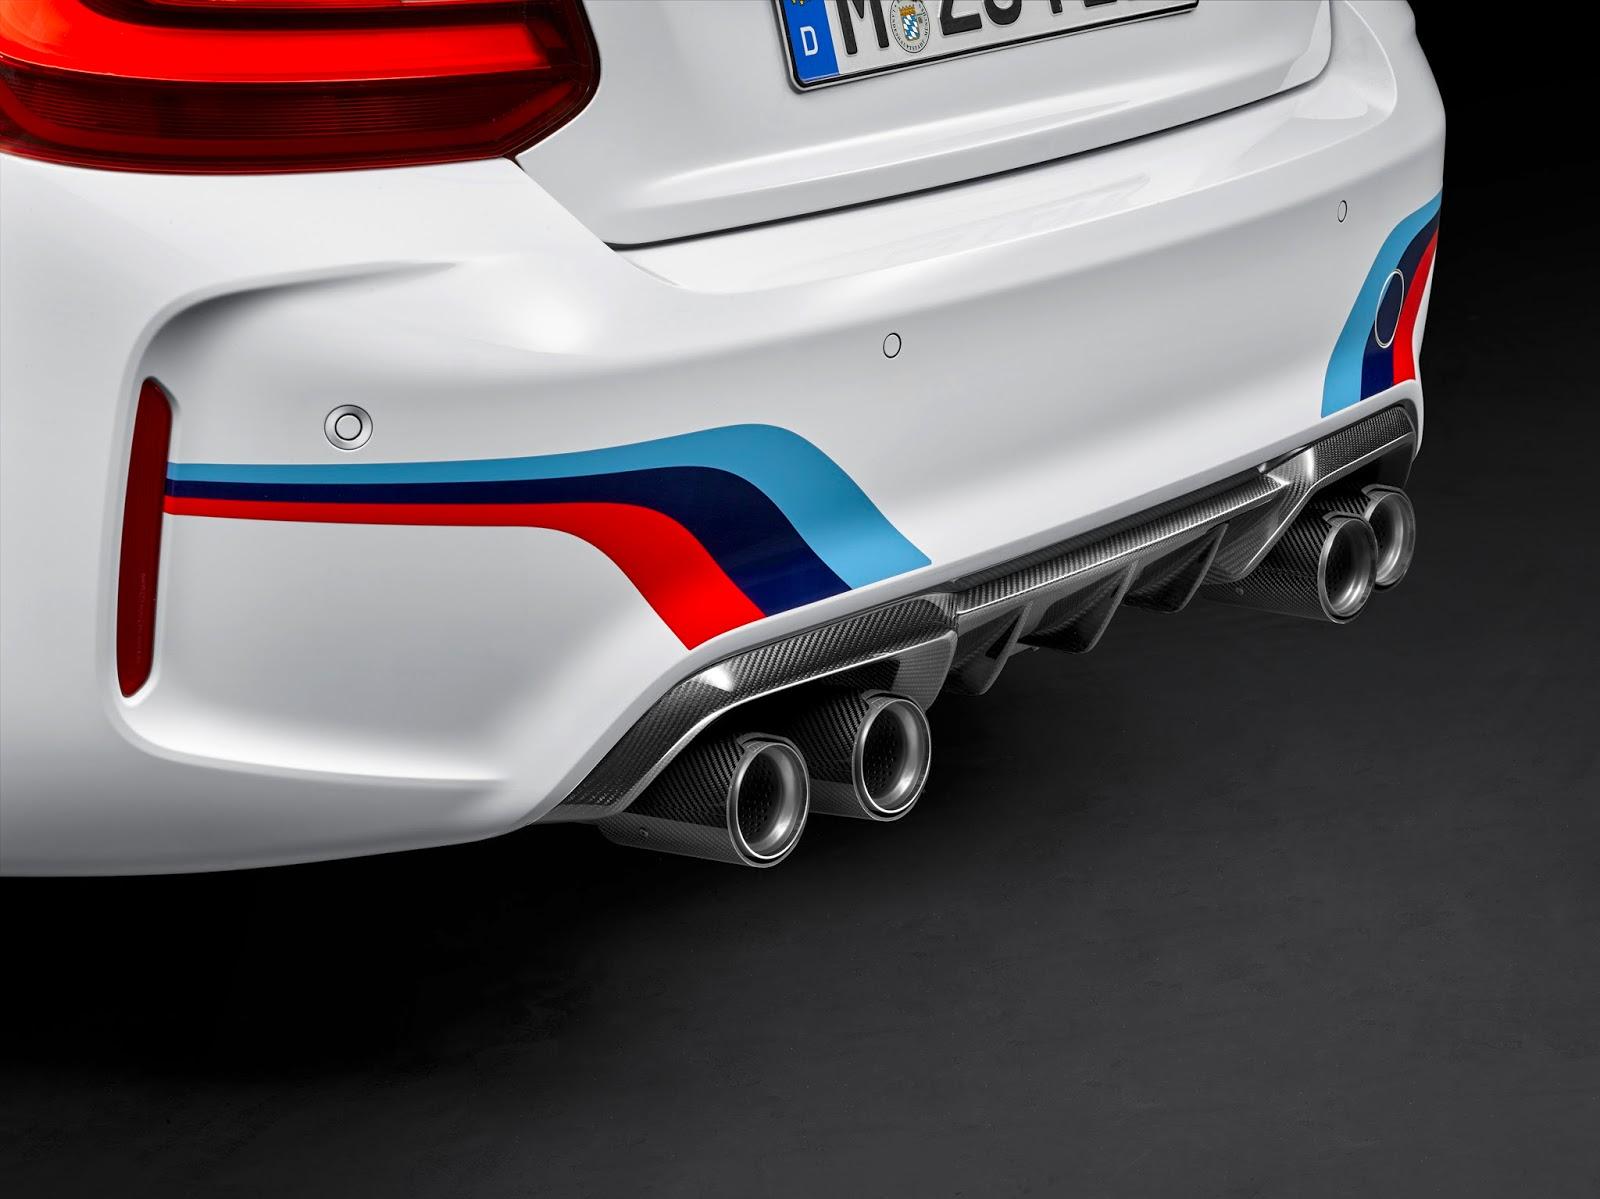 P90203605 highRes bmw m2 coup with bmw Νέα Αξεσουάρ M Performance για τη νέα BMW M2 Coupé. BMW, BMW M2, BMW M2 Coupé, Αξεσουάρ